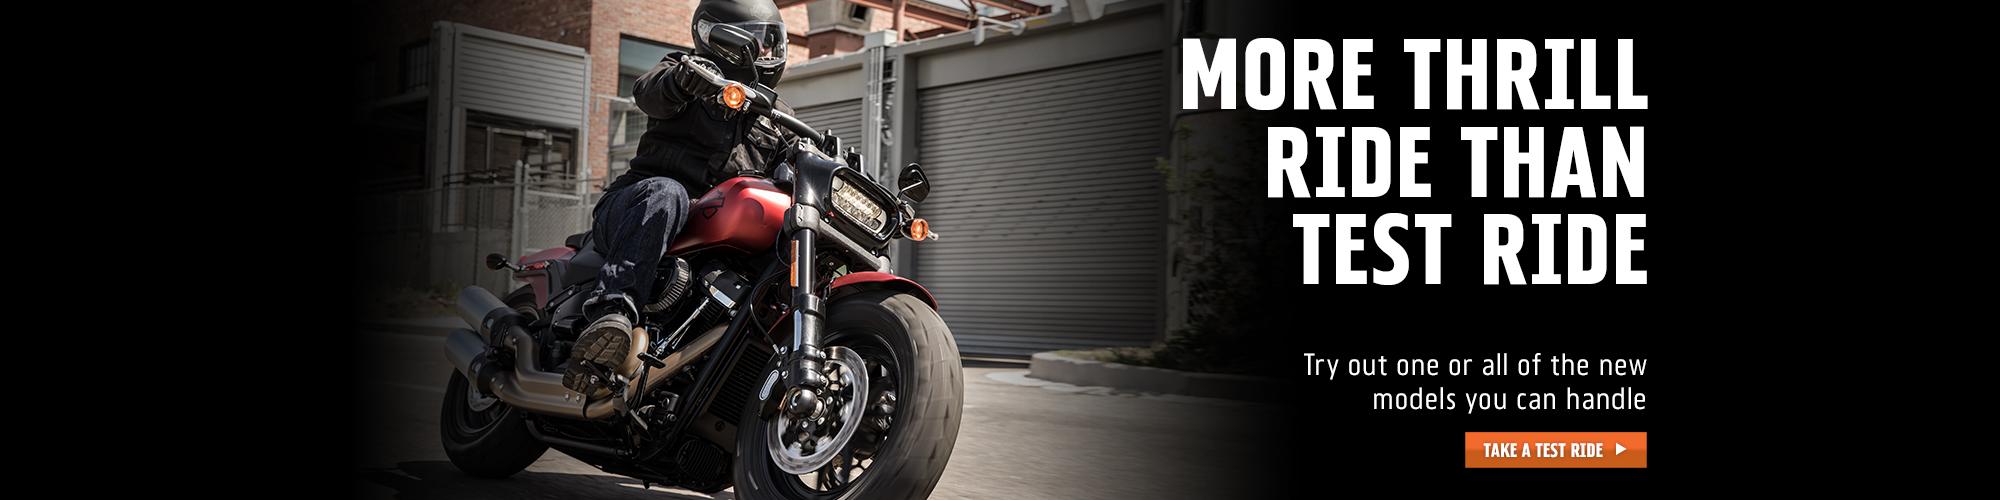 Harley-Davidson More Thrill Than Test Ride at Destination Harley-Davidson Silverdale